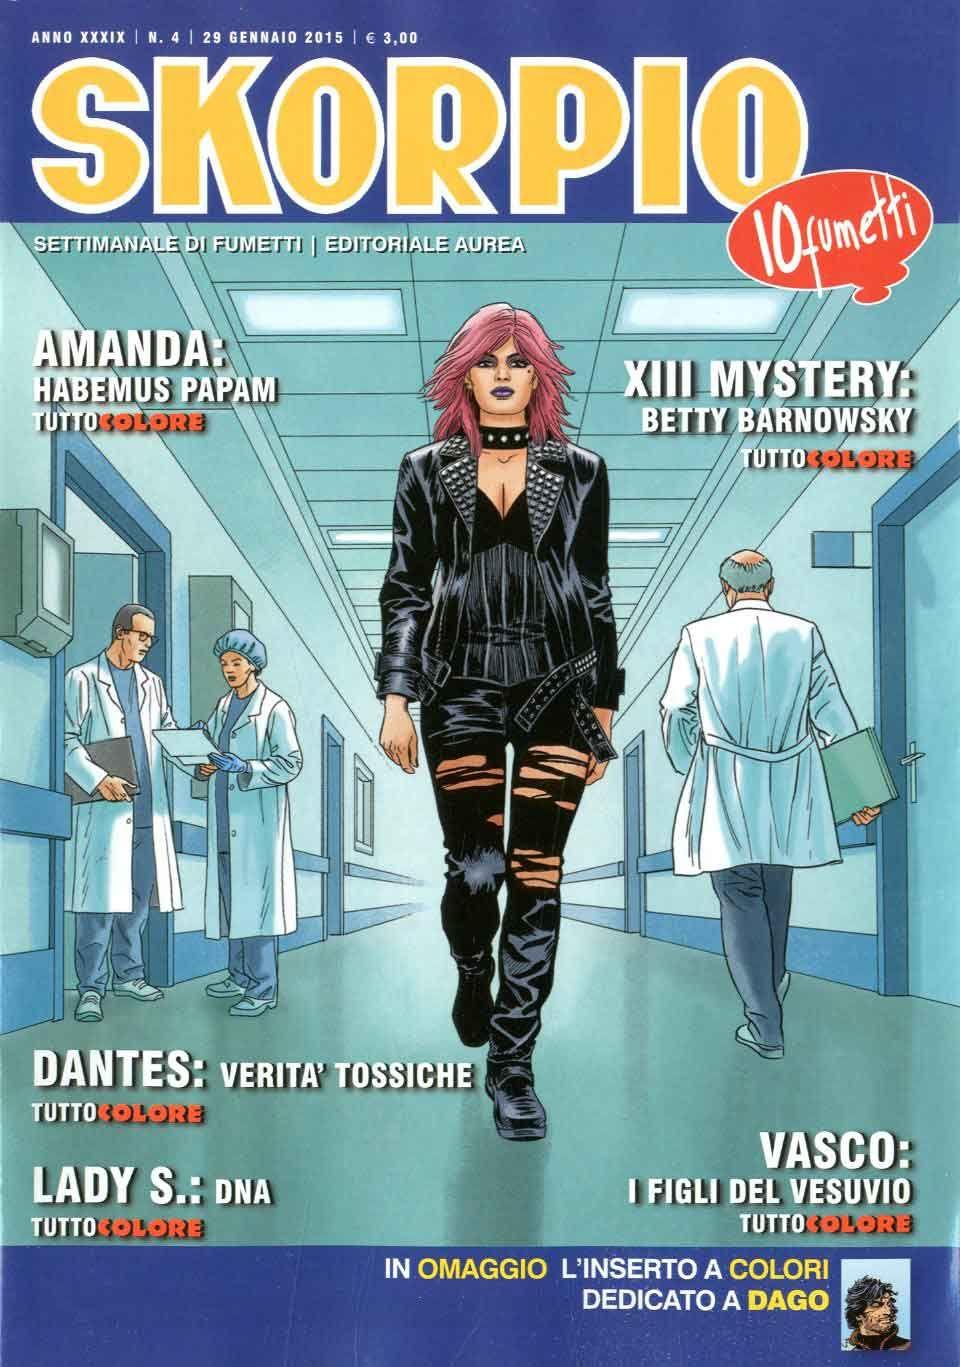 Fumetti EDITORIALE AUREA, Collana SKORPIO ANNEE 39 - 201504